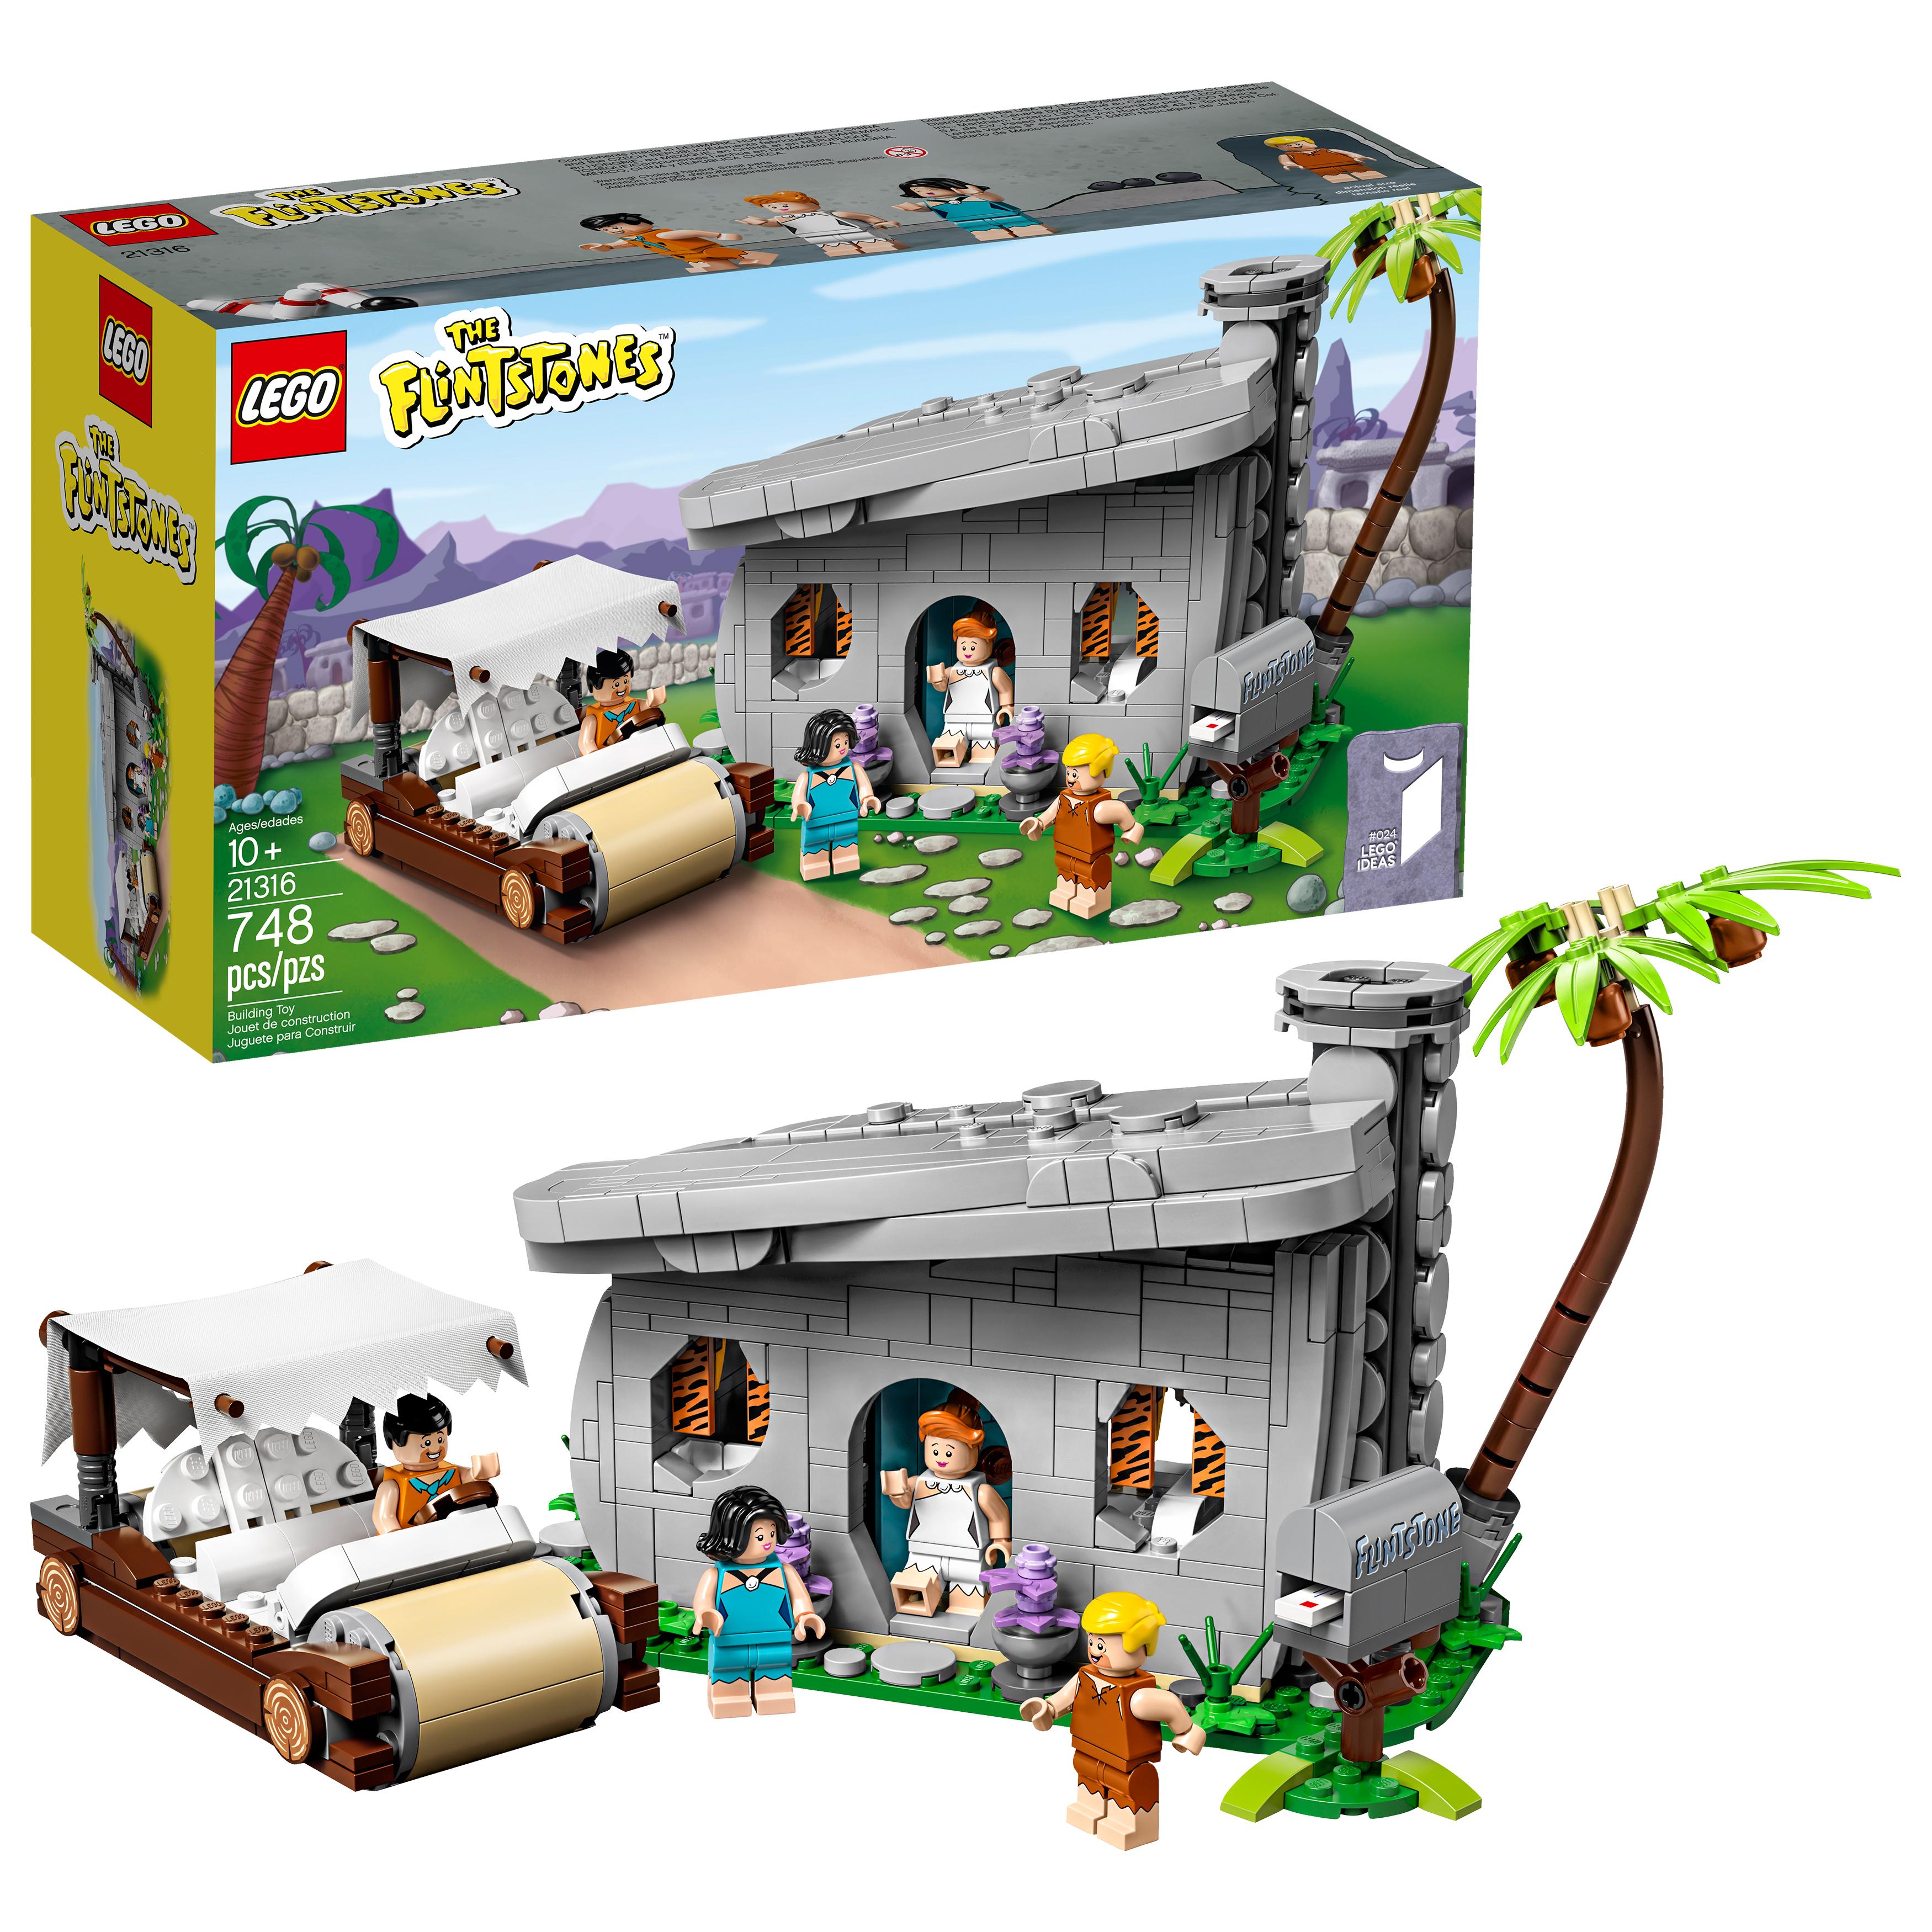 LEGO Ideas The Flintstones 21316 - $49.99 at Walmart